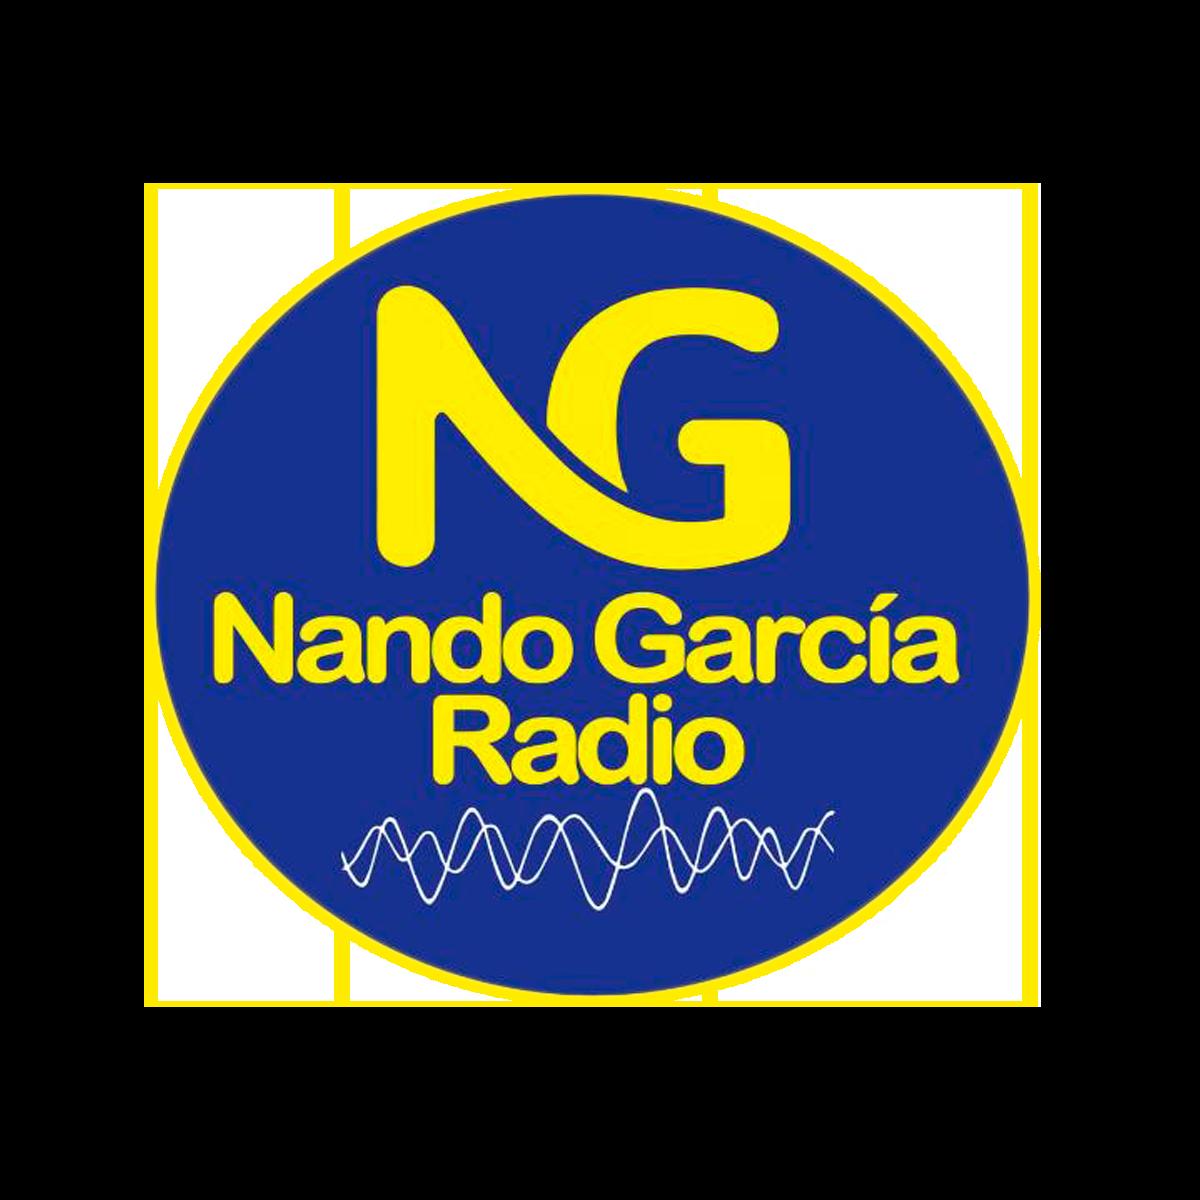 NANDO GARCIA RADIO